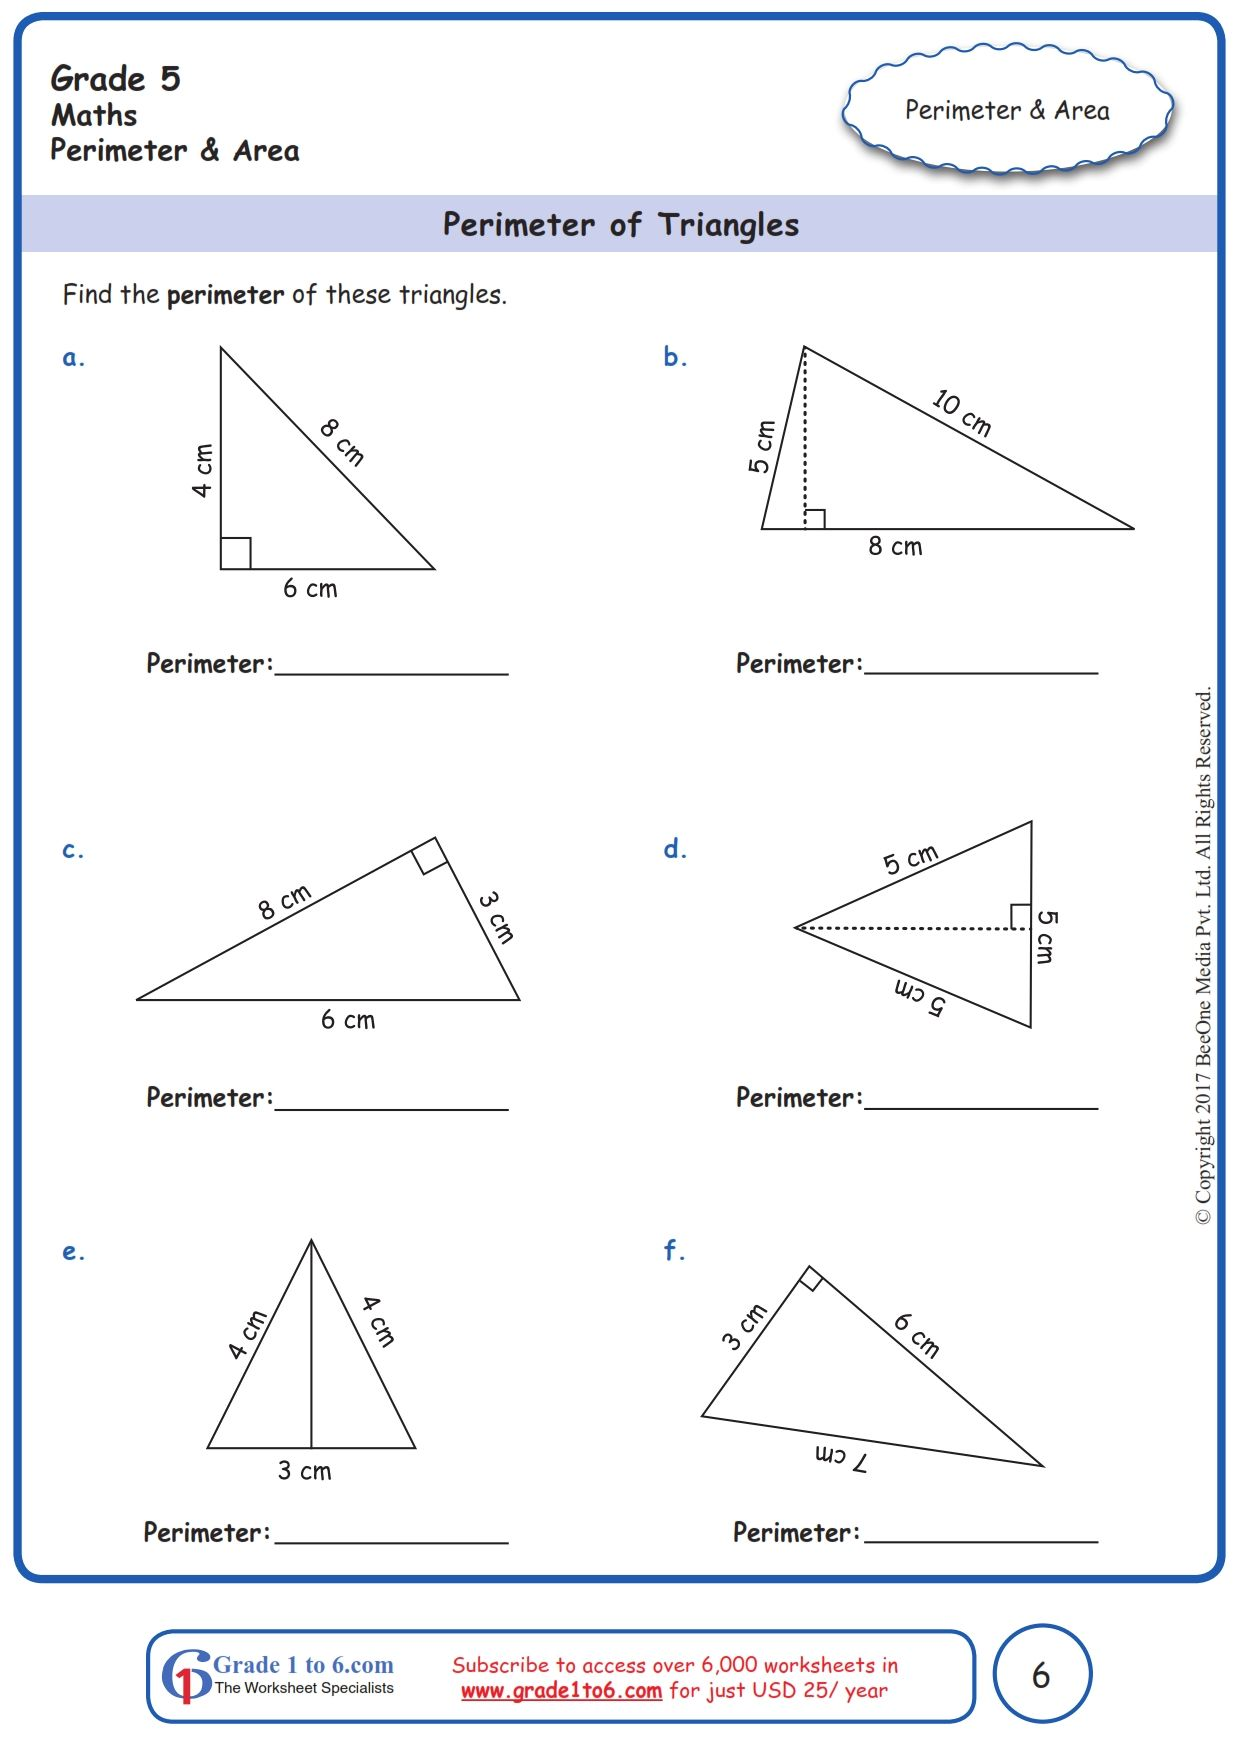 small resolution of Worksheet Grade 5 Math Perimeter of Triangles   Perimeter worksheets